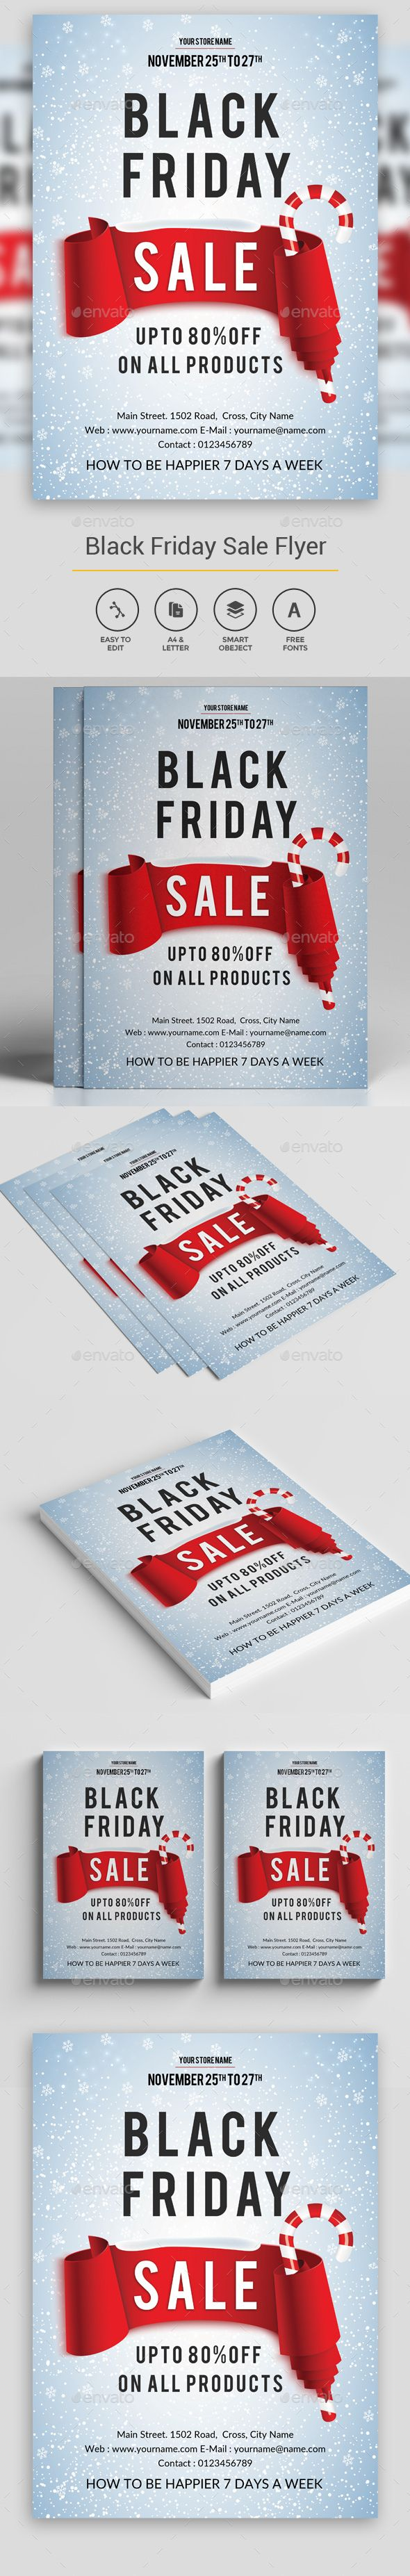 Black Friday Flyer Template PSD #design Download: http://graphicriver.net/item/black-friday-flyer/13617409?ref=ksioks